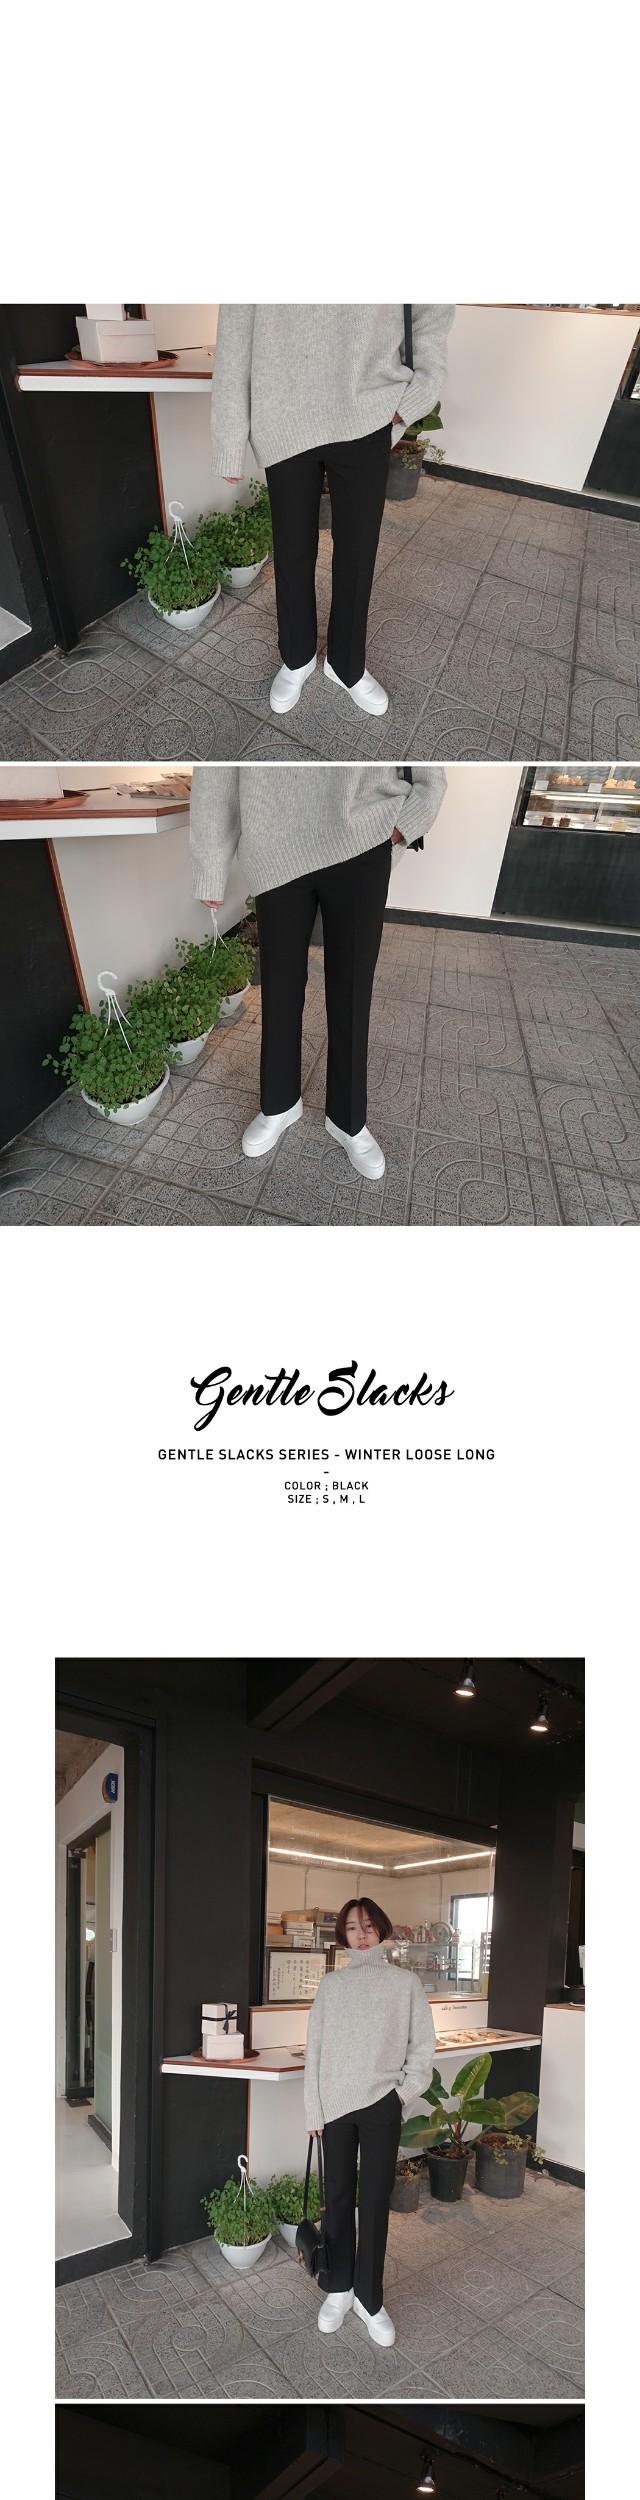 Gentle-Slacks